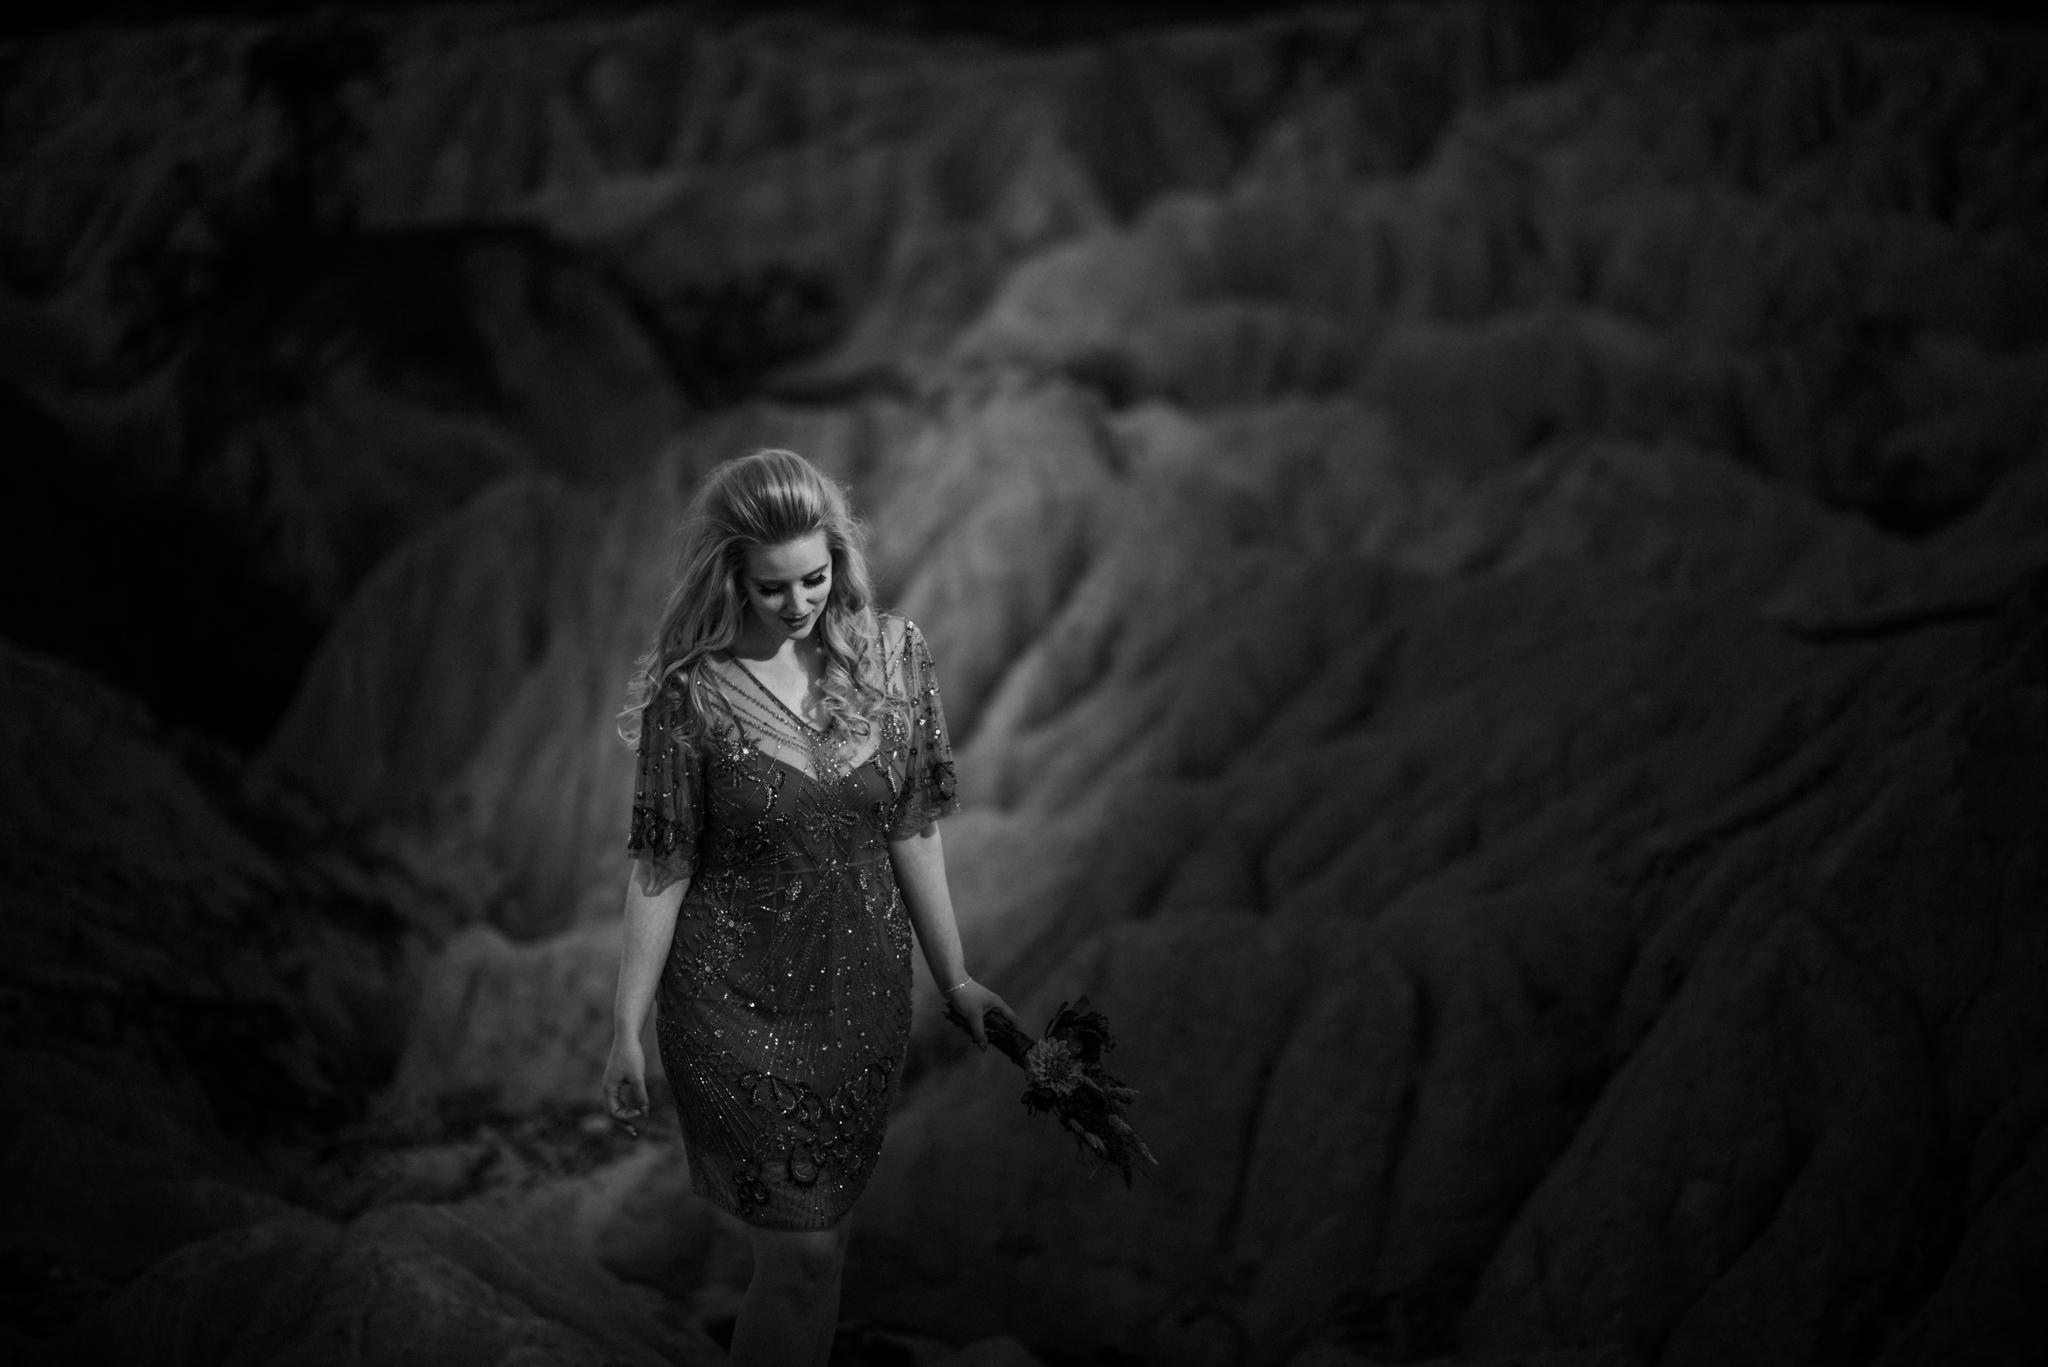 LOVELENSCAPES PHOTOGRAPHY • VISUAL POETRY • MELBOURNE WEDDING PHOTOGRAPHER • ALANNAH HILL DRESS • SUNSET ENGAGEMENT PHOTOS • PINK CLIFFS HEATHCOTE • FASHION EDITORIAL PHOTOGRAPHER • 20.jpg